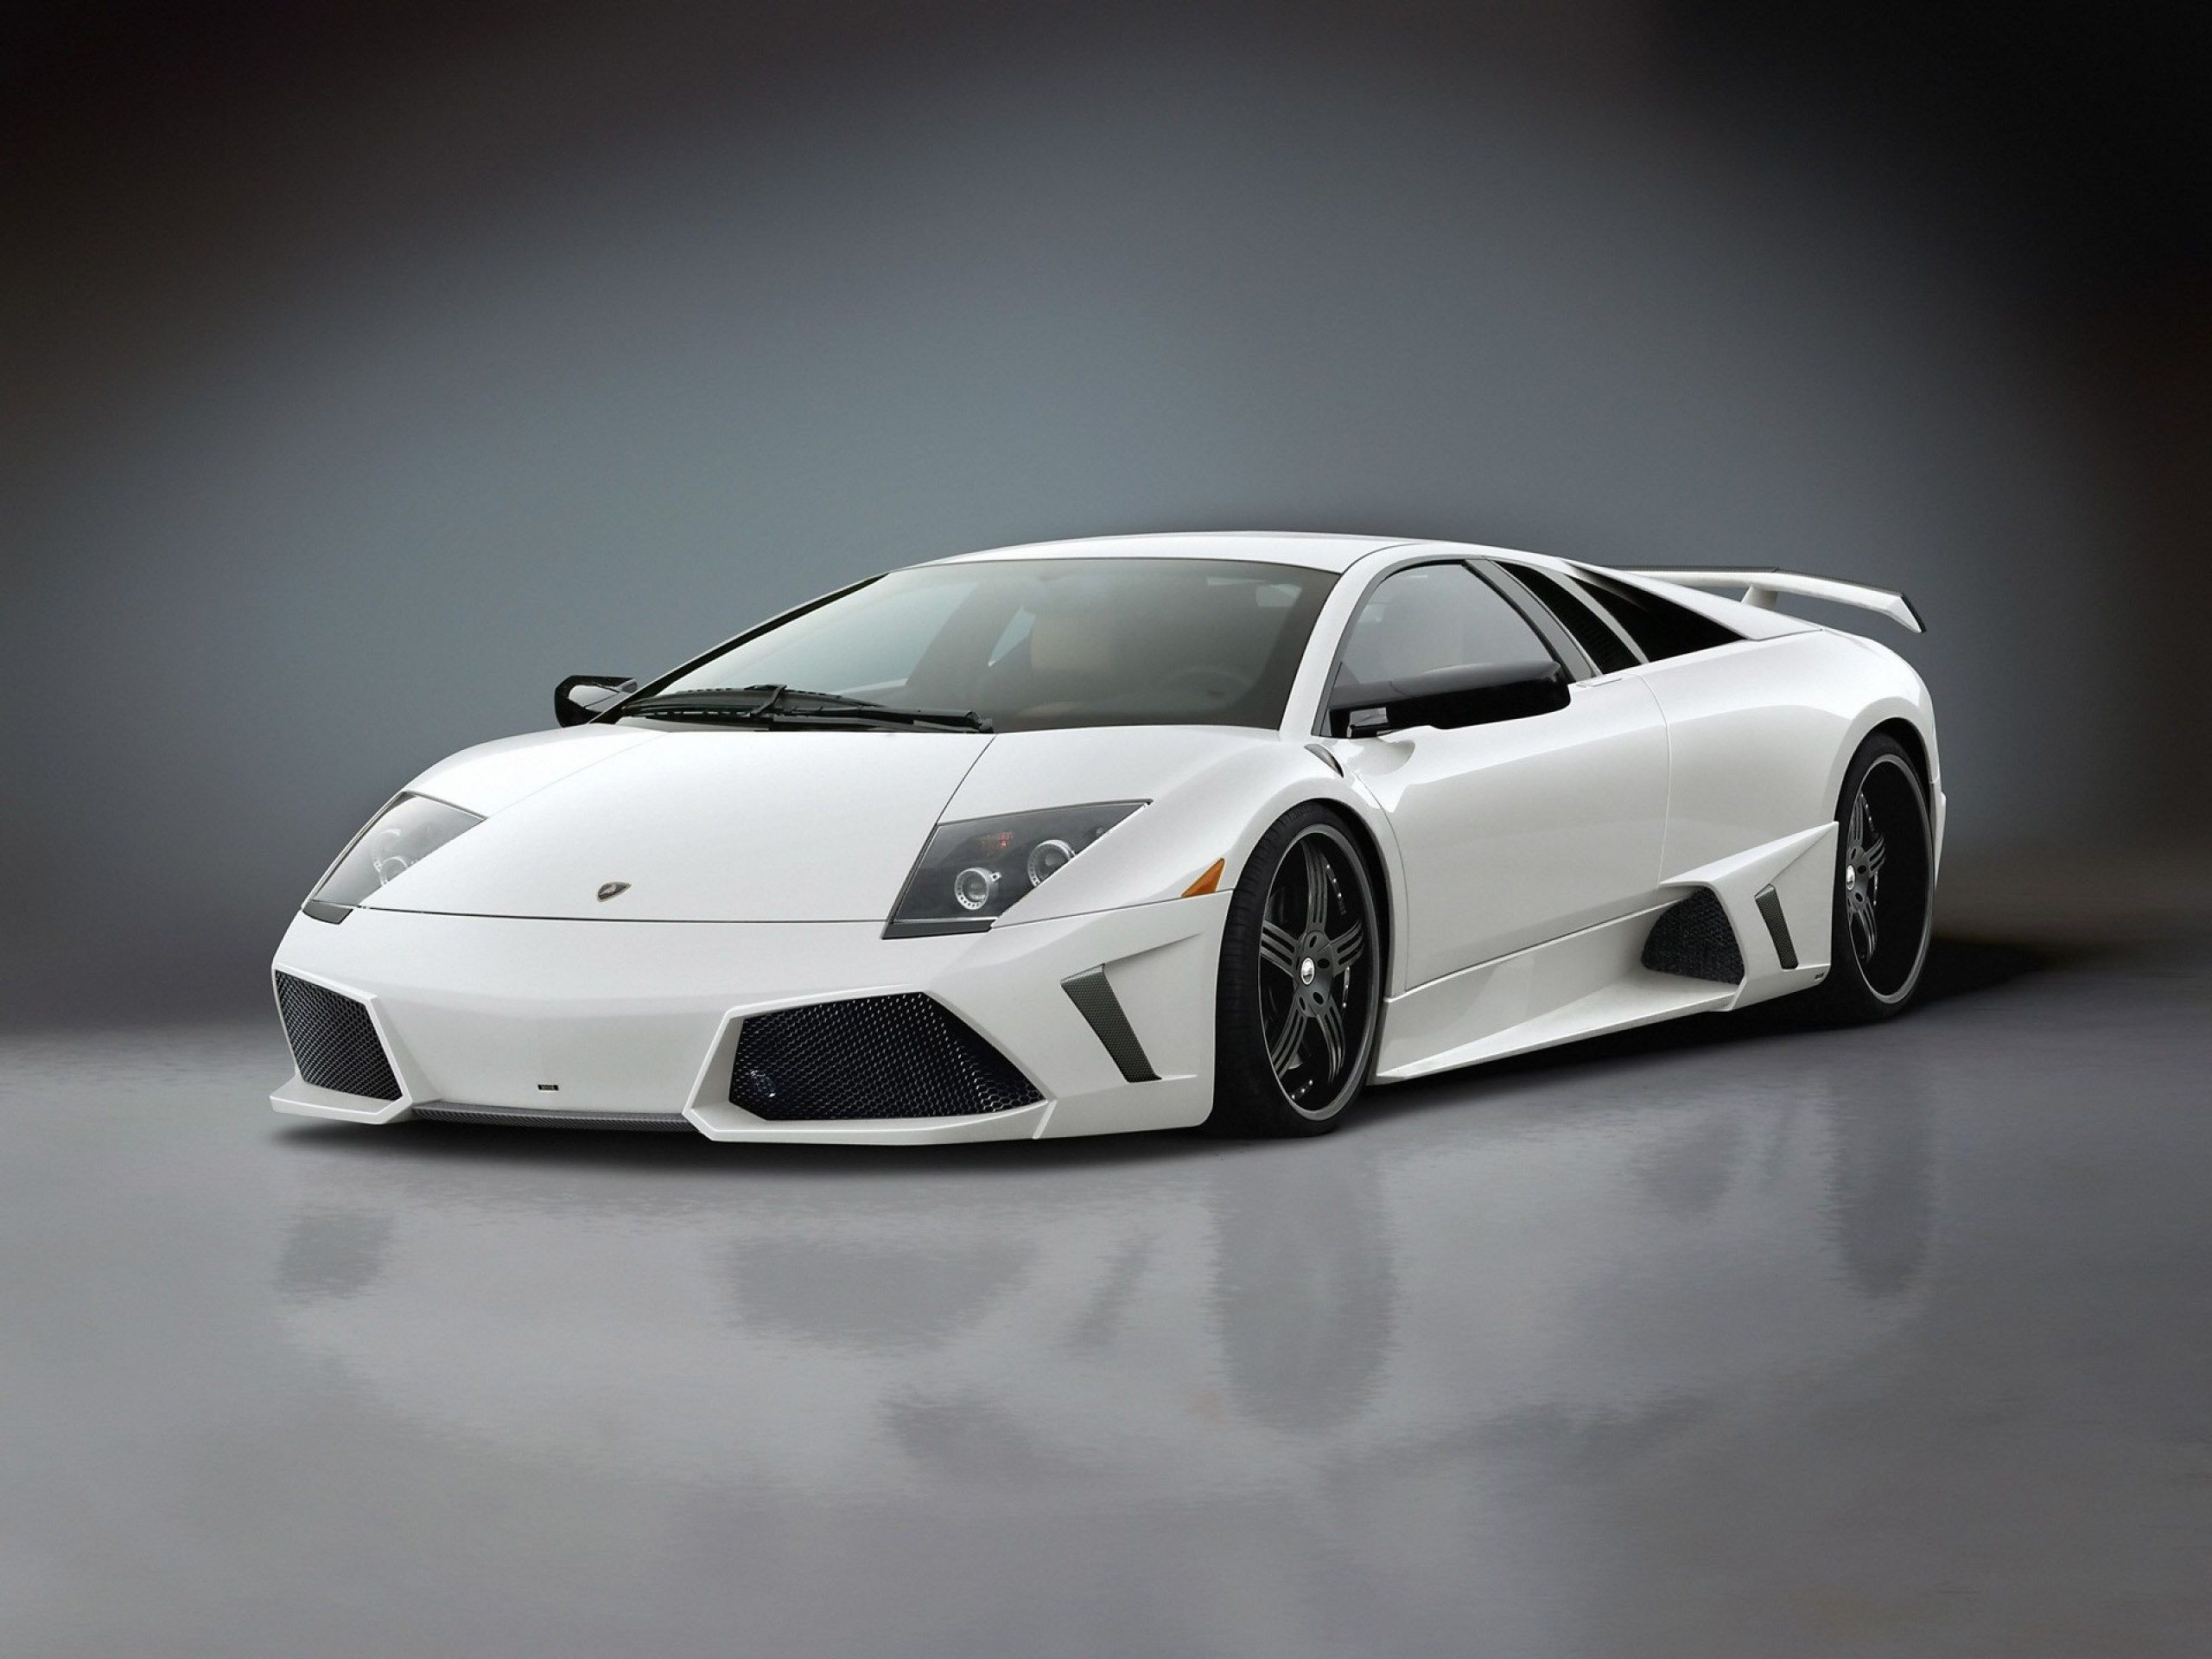 2bf9d412f5f30452ffcbb3b93fde3f3b Exciting Lamborghini Huracán Lp 610-4 Cena Cars Trend